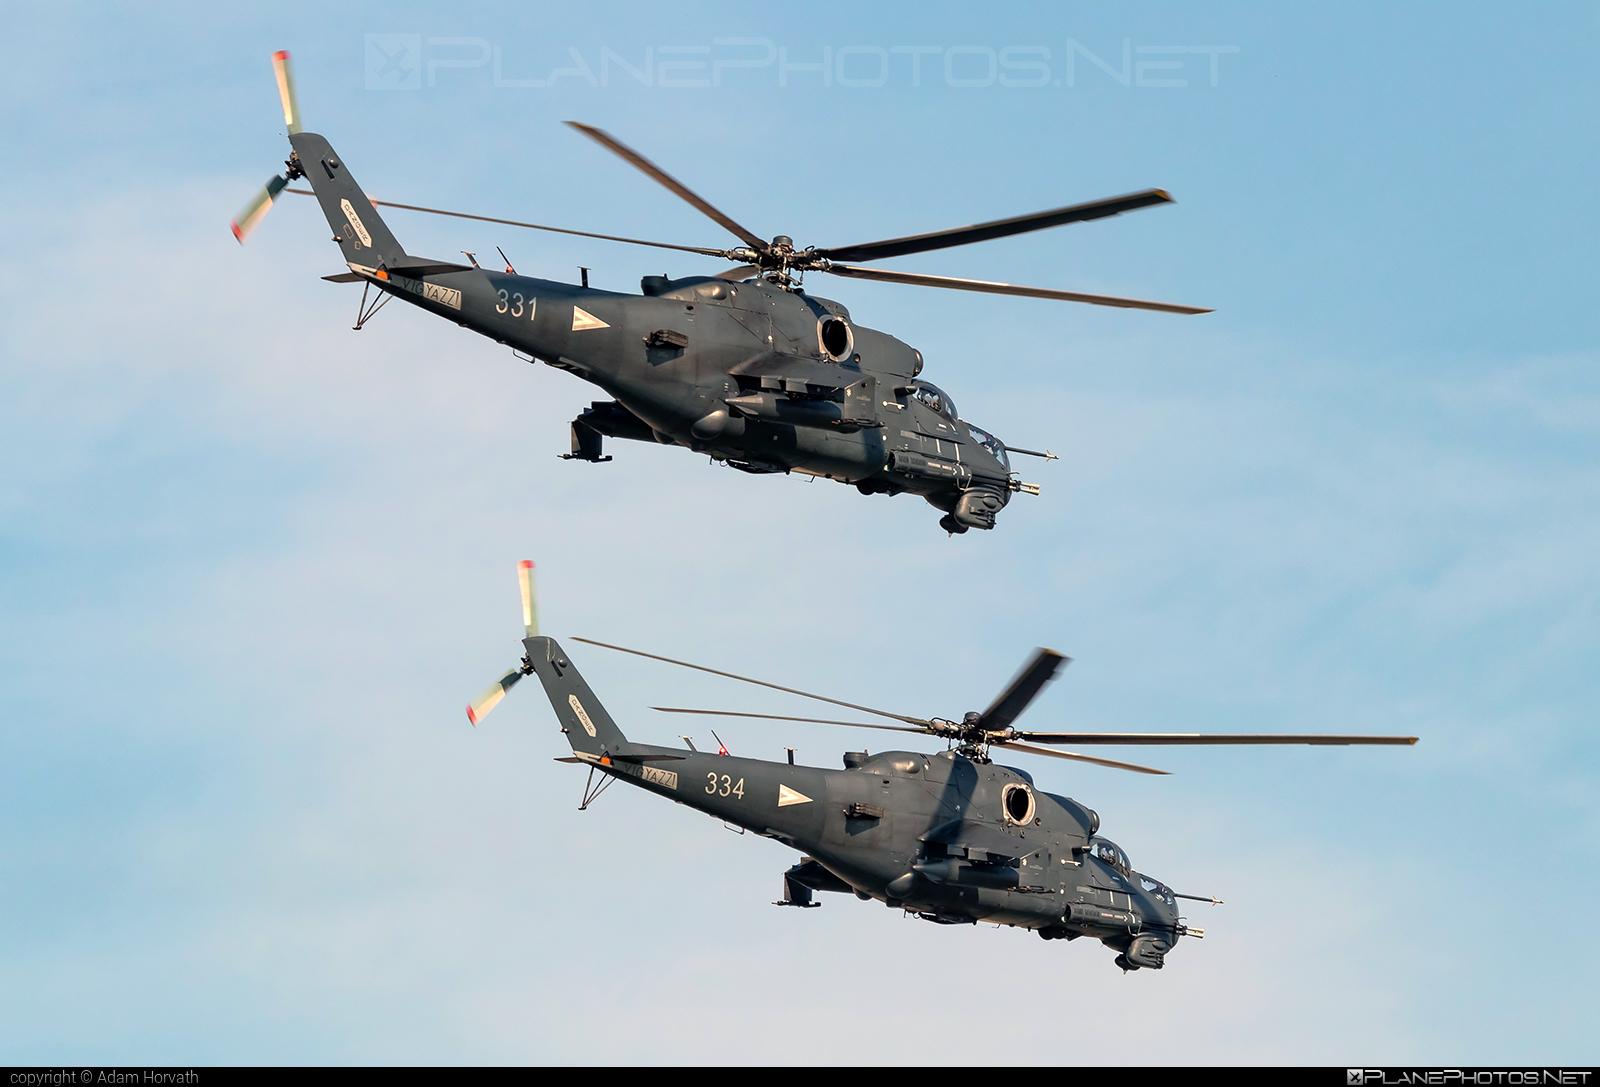 Mil Mi-24P - 334 operated by Magyar Légierő (Hungarian Air Force) #hungarianairforce #magyarlegiero #mi24 #mi24p #mil #mil24 #mil24p #milhelicopters